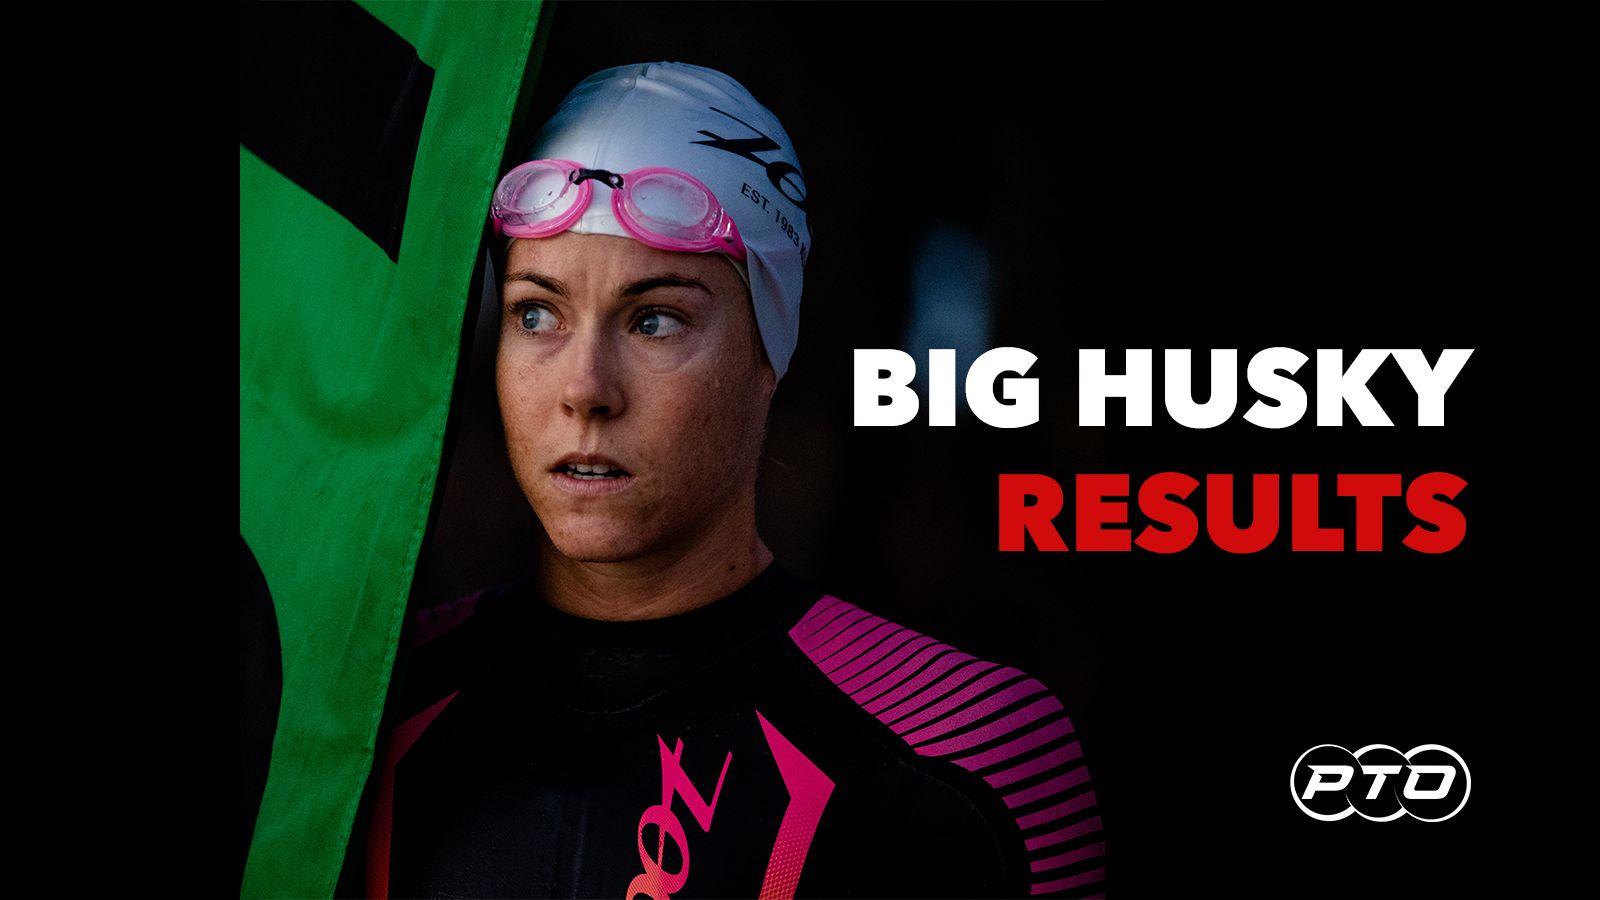 Big Husky Triathlon: Salthouse and Hearn take the spoils